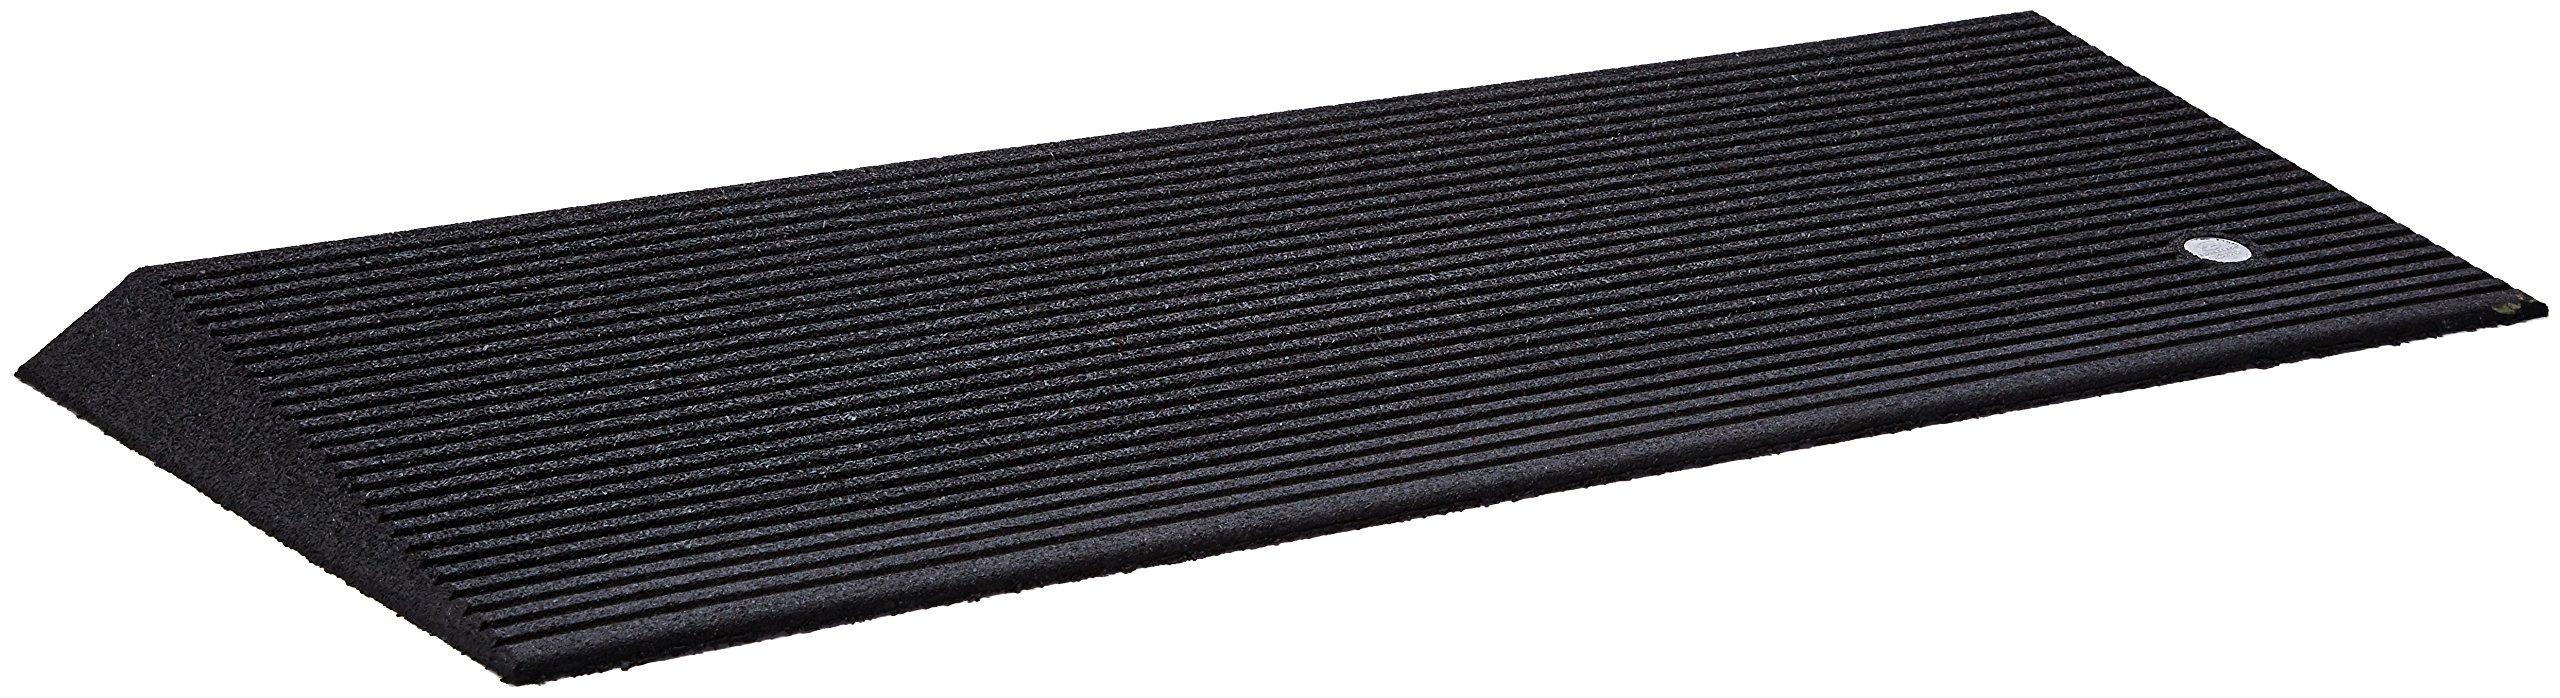 Ez-Access Rubber Threshold Ramp Beveled, 1.5 Inch, 14 Pound